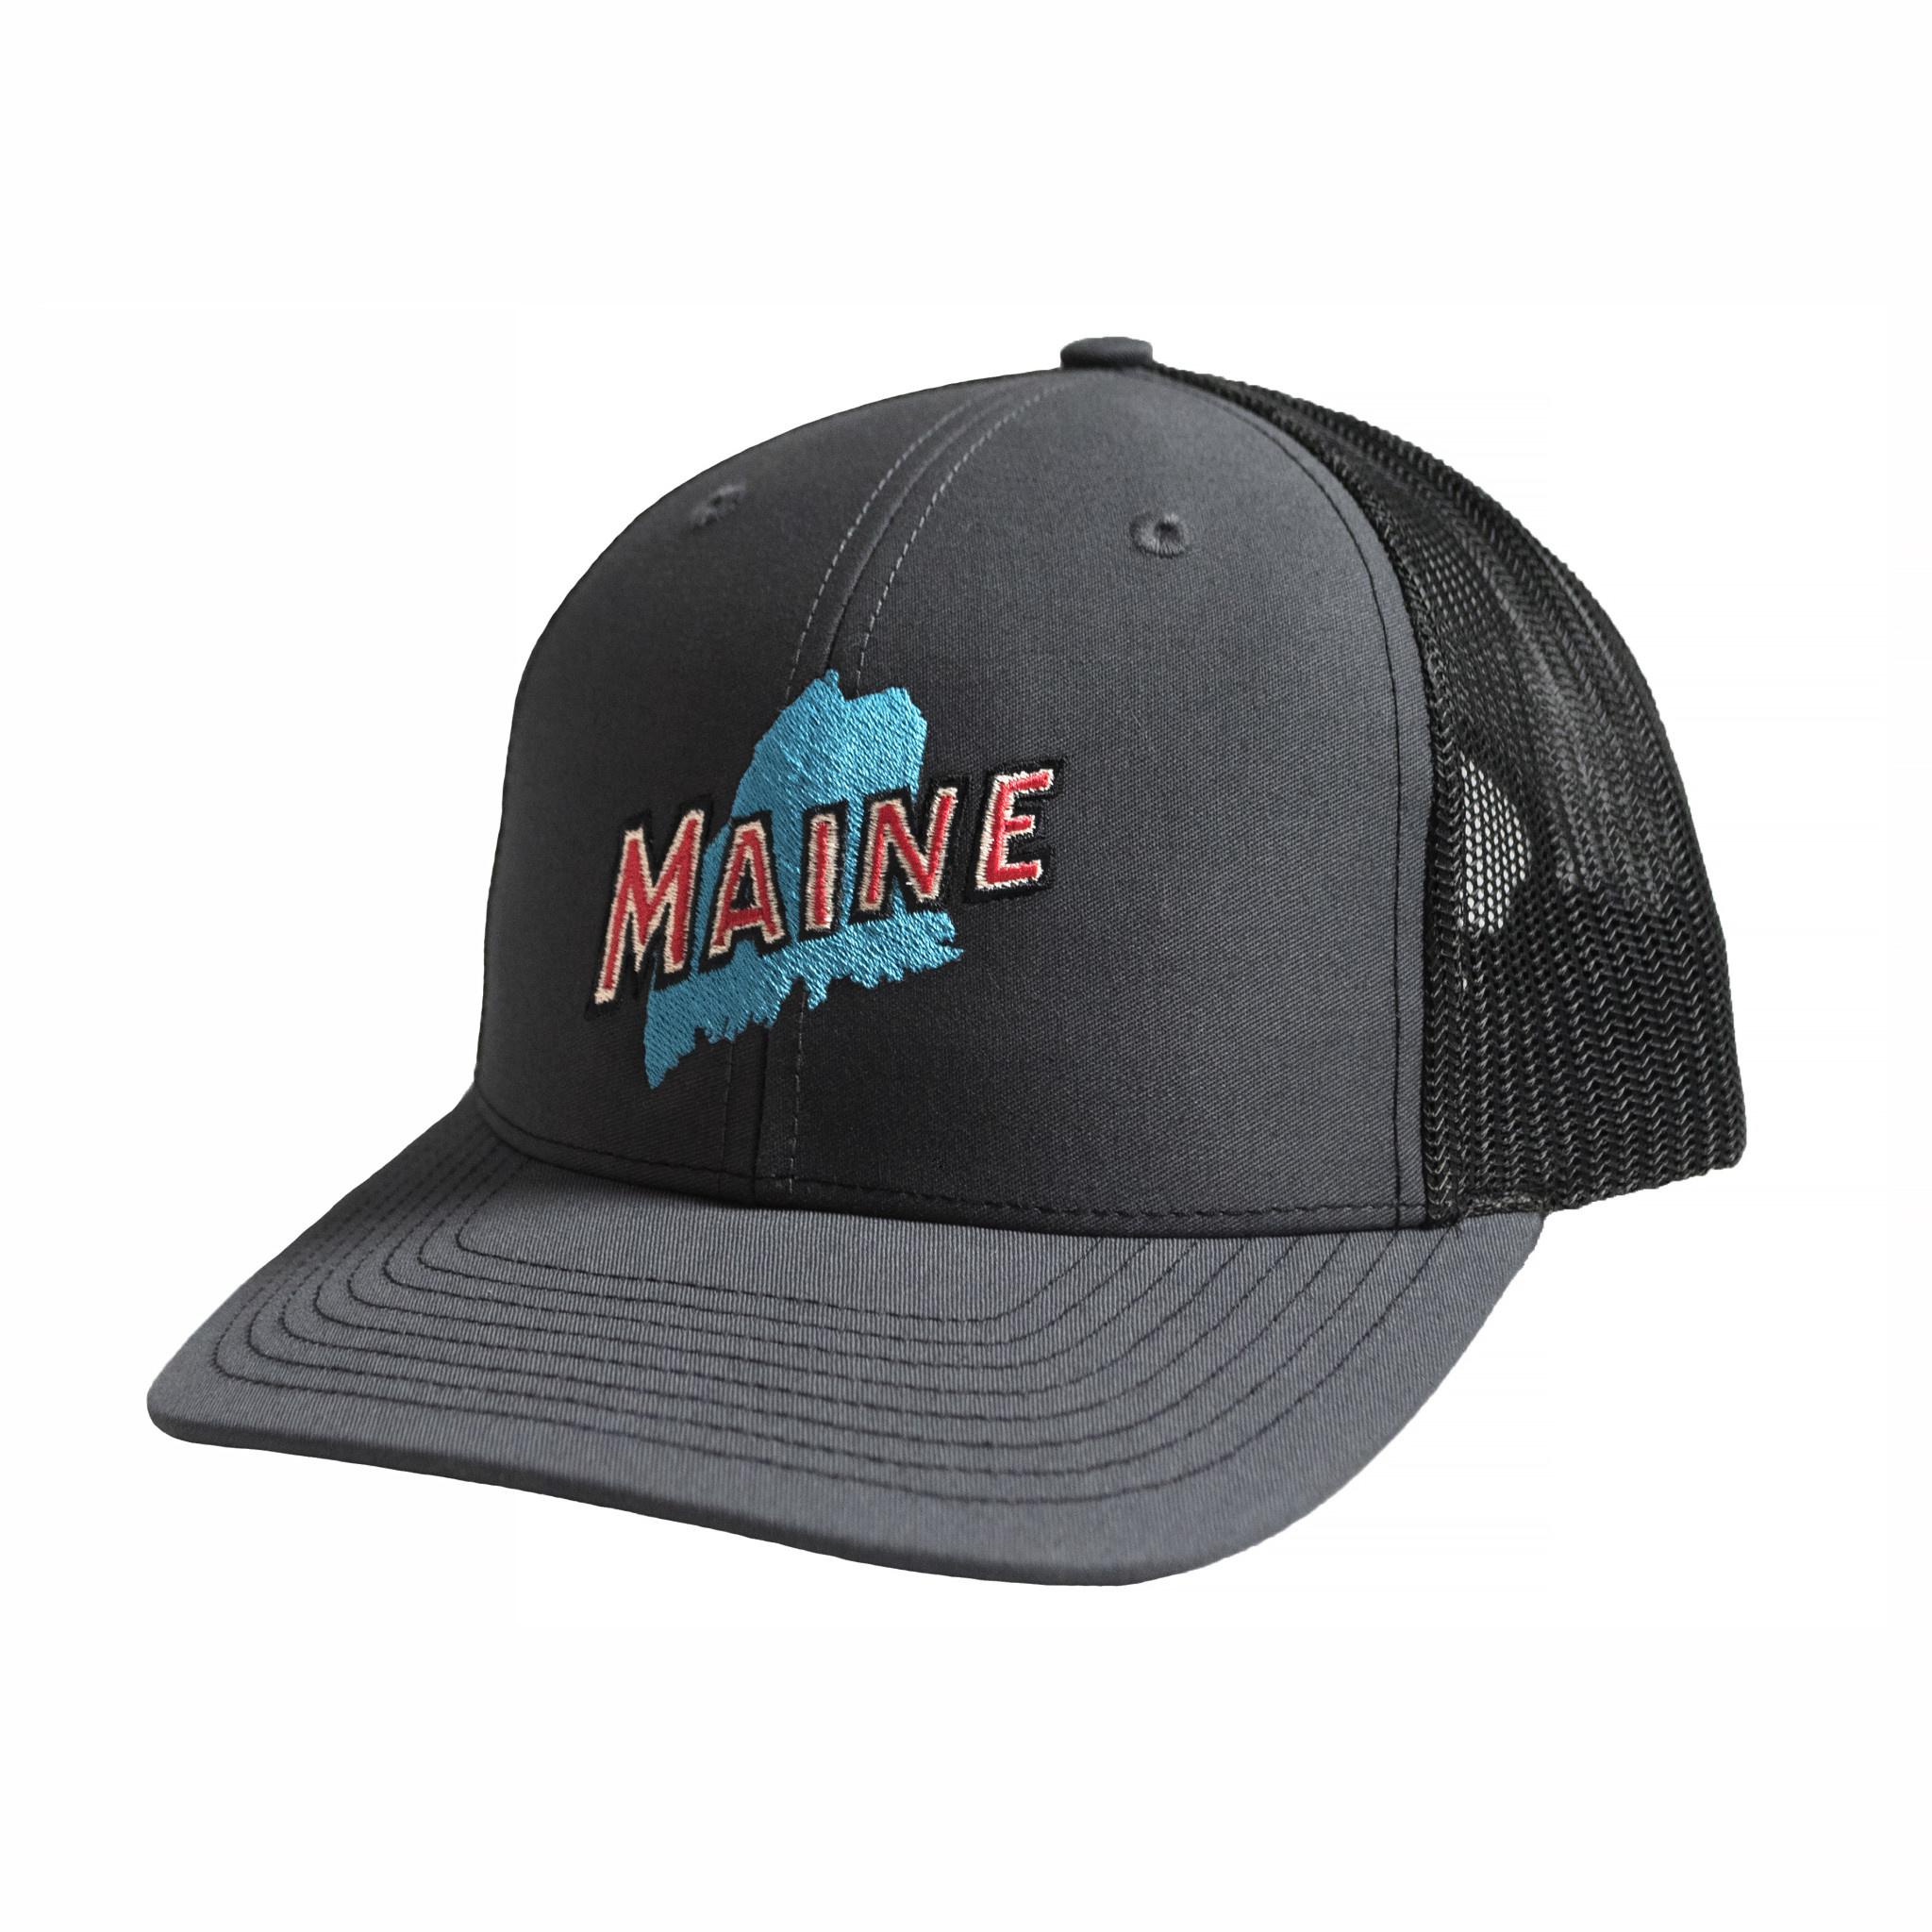 Retro Maine Trucker Hat - Charcoal